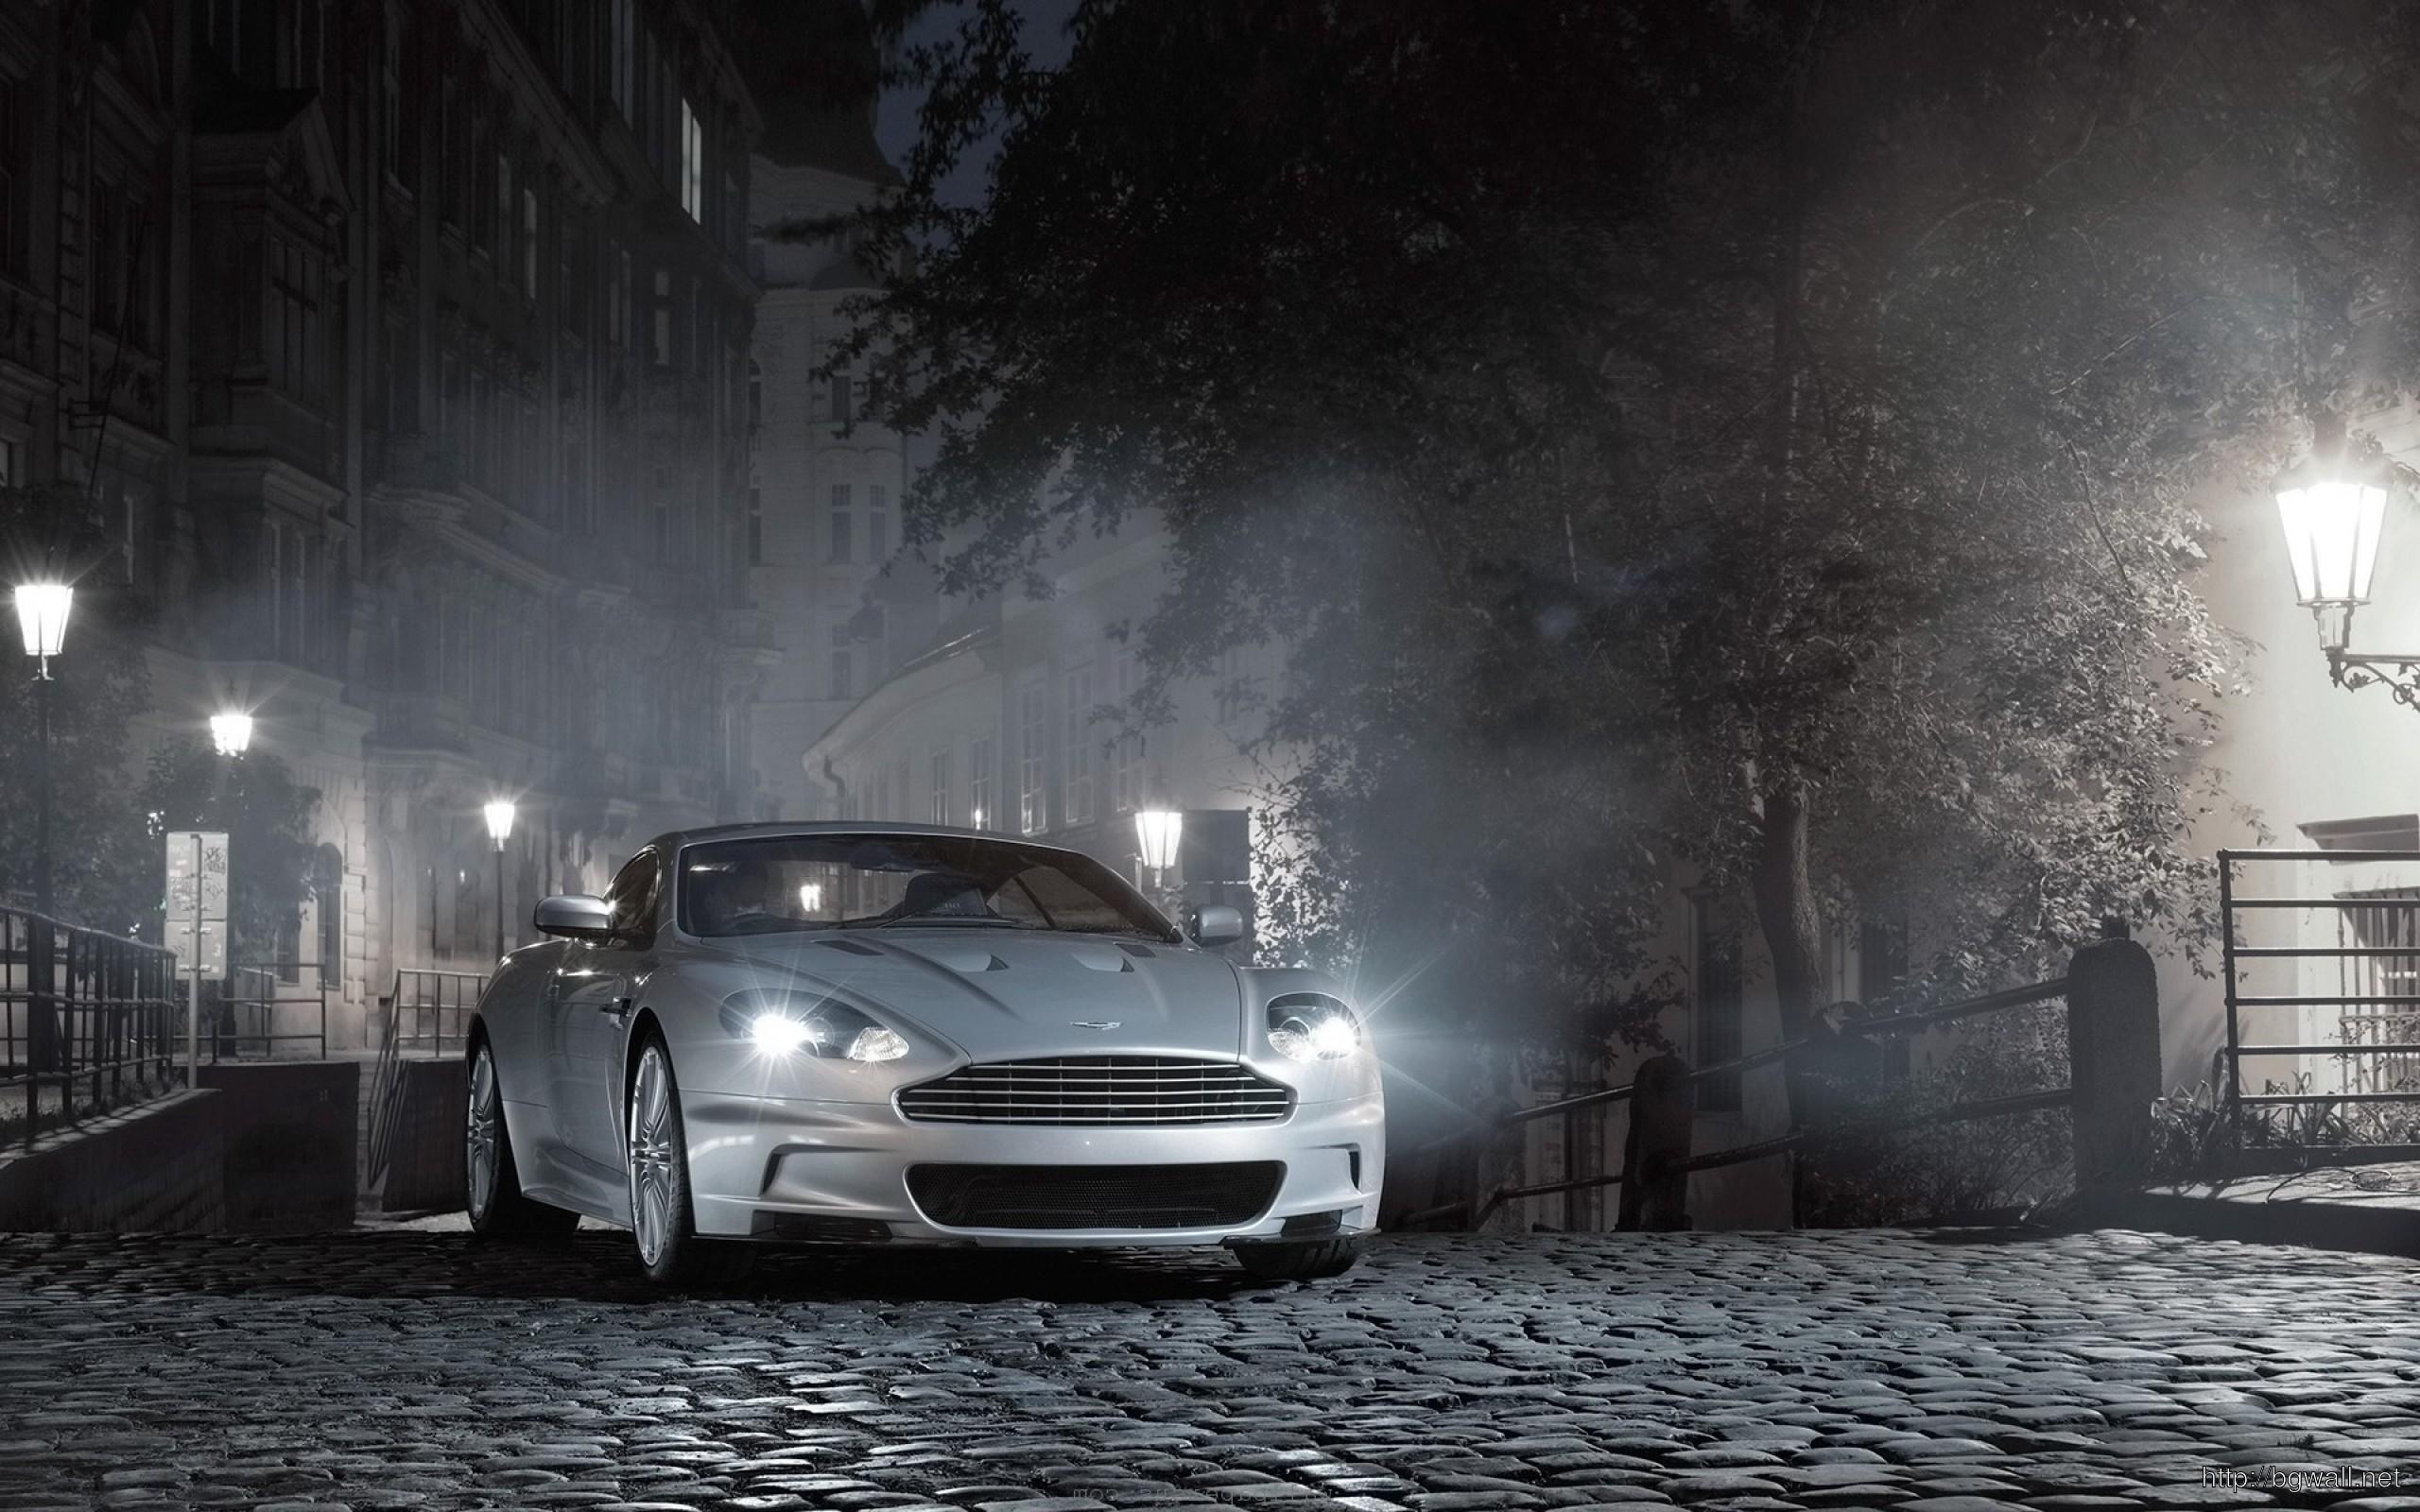 Aston-Martin-Free-Download-Wallpaper